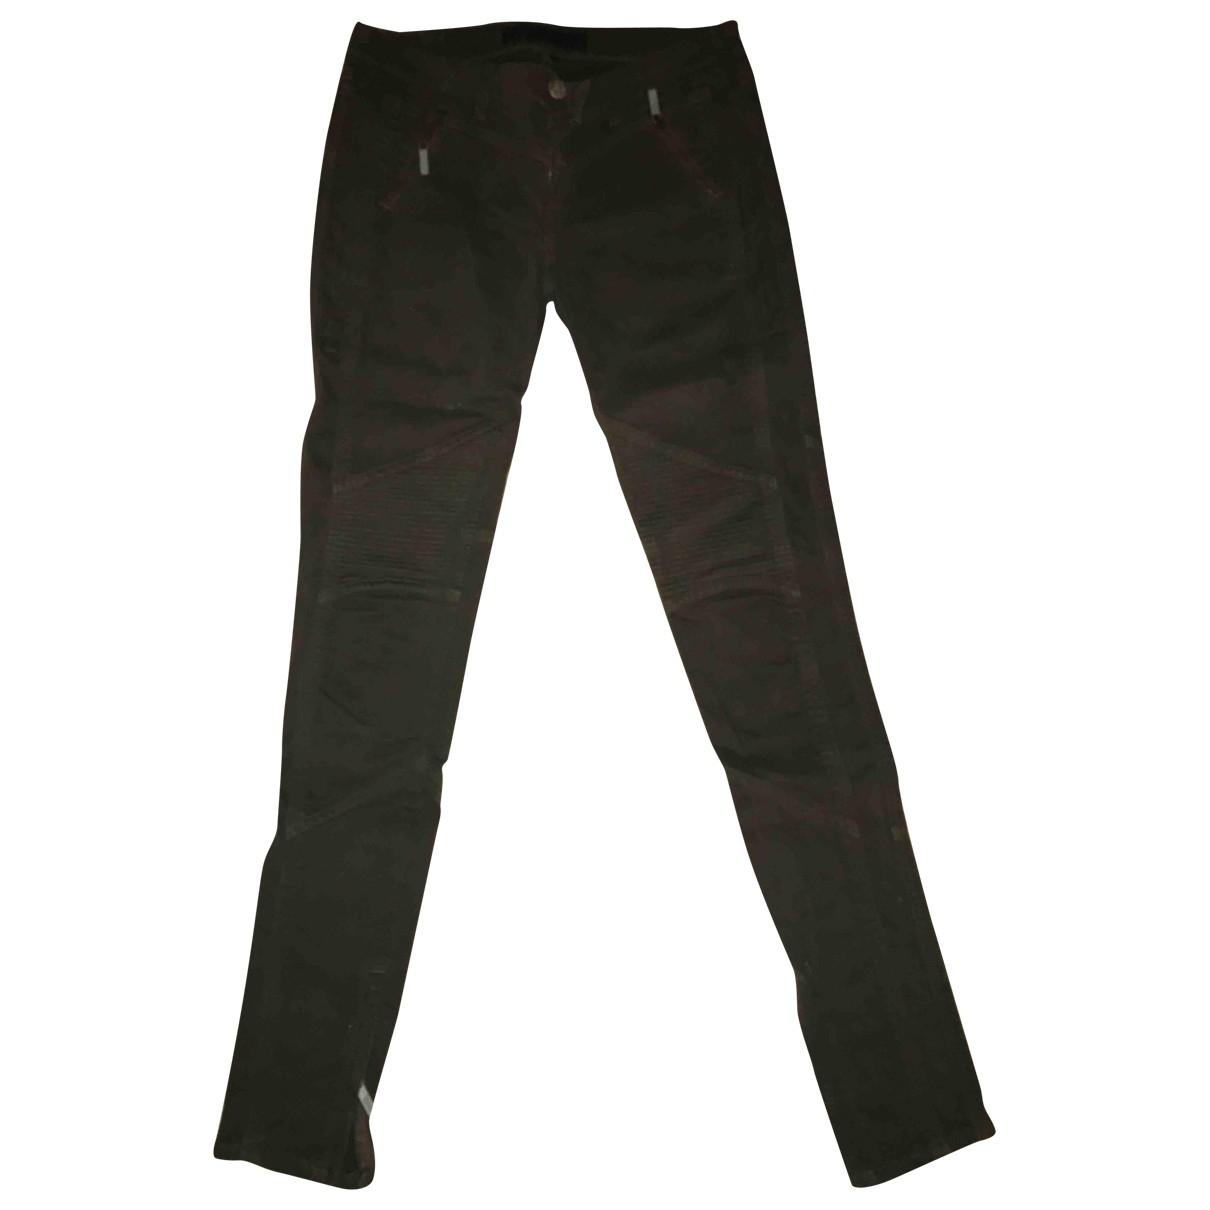 Karl Lagerfeld \N Khaki Cotton Trousers for Women 34 FR